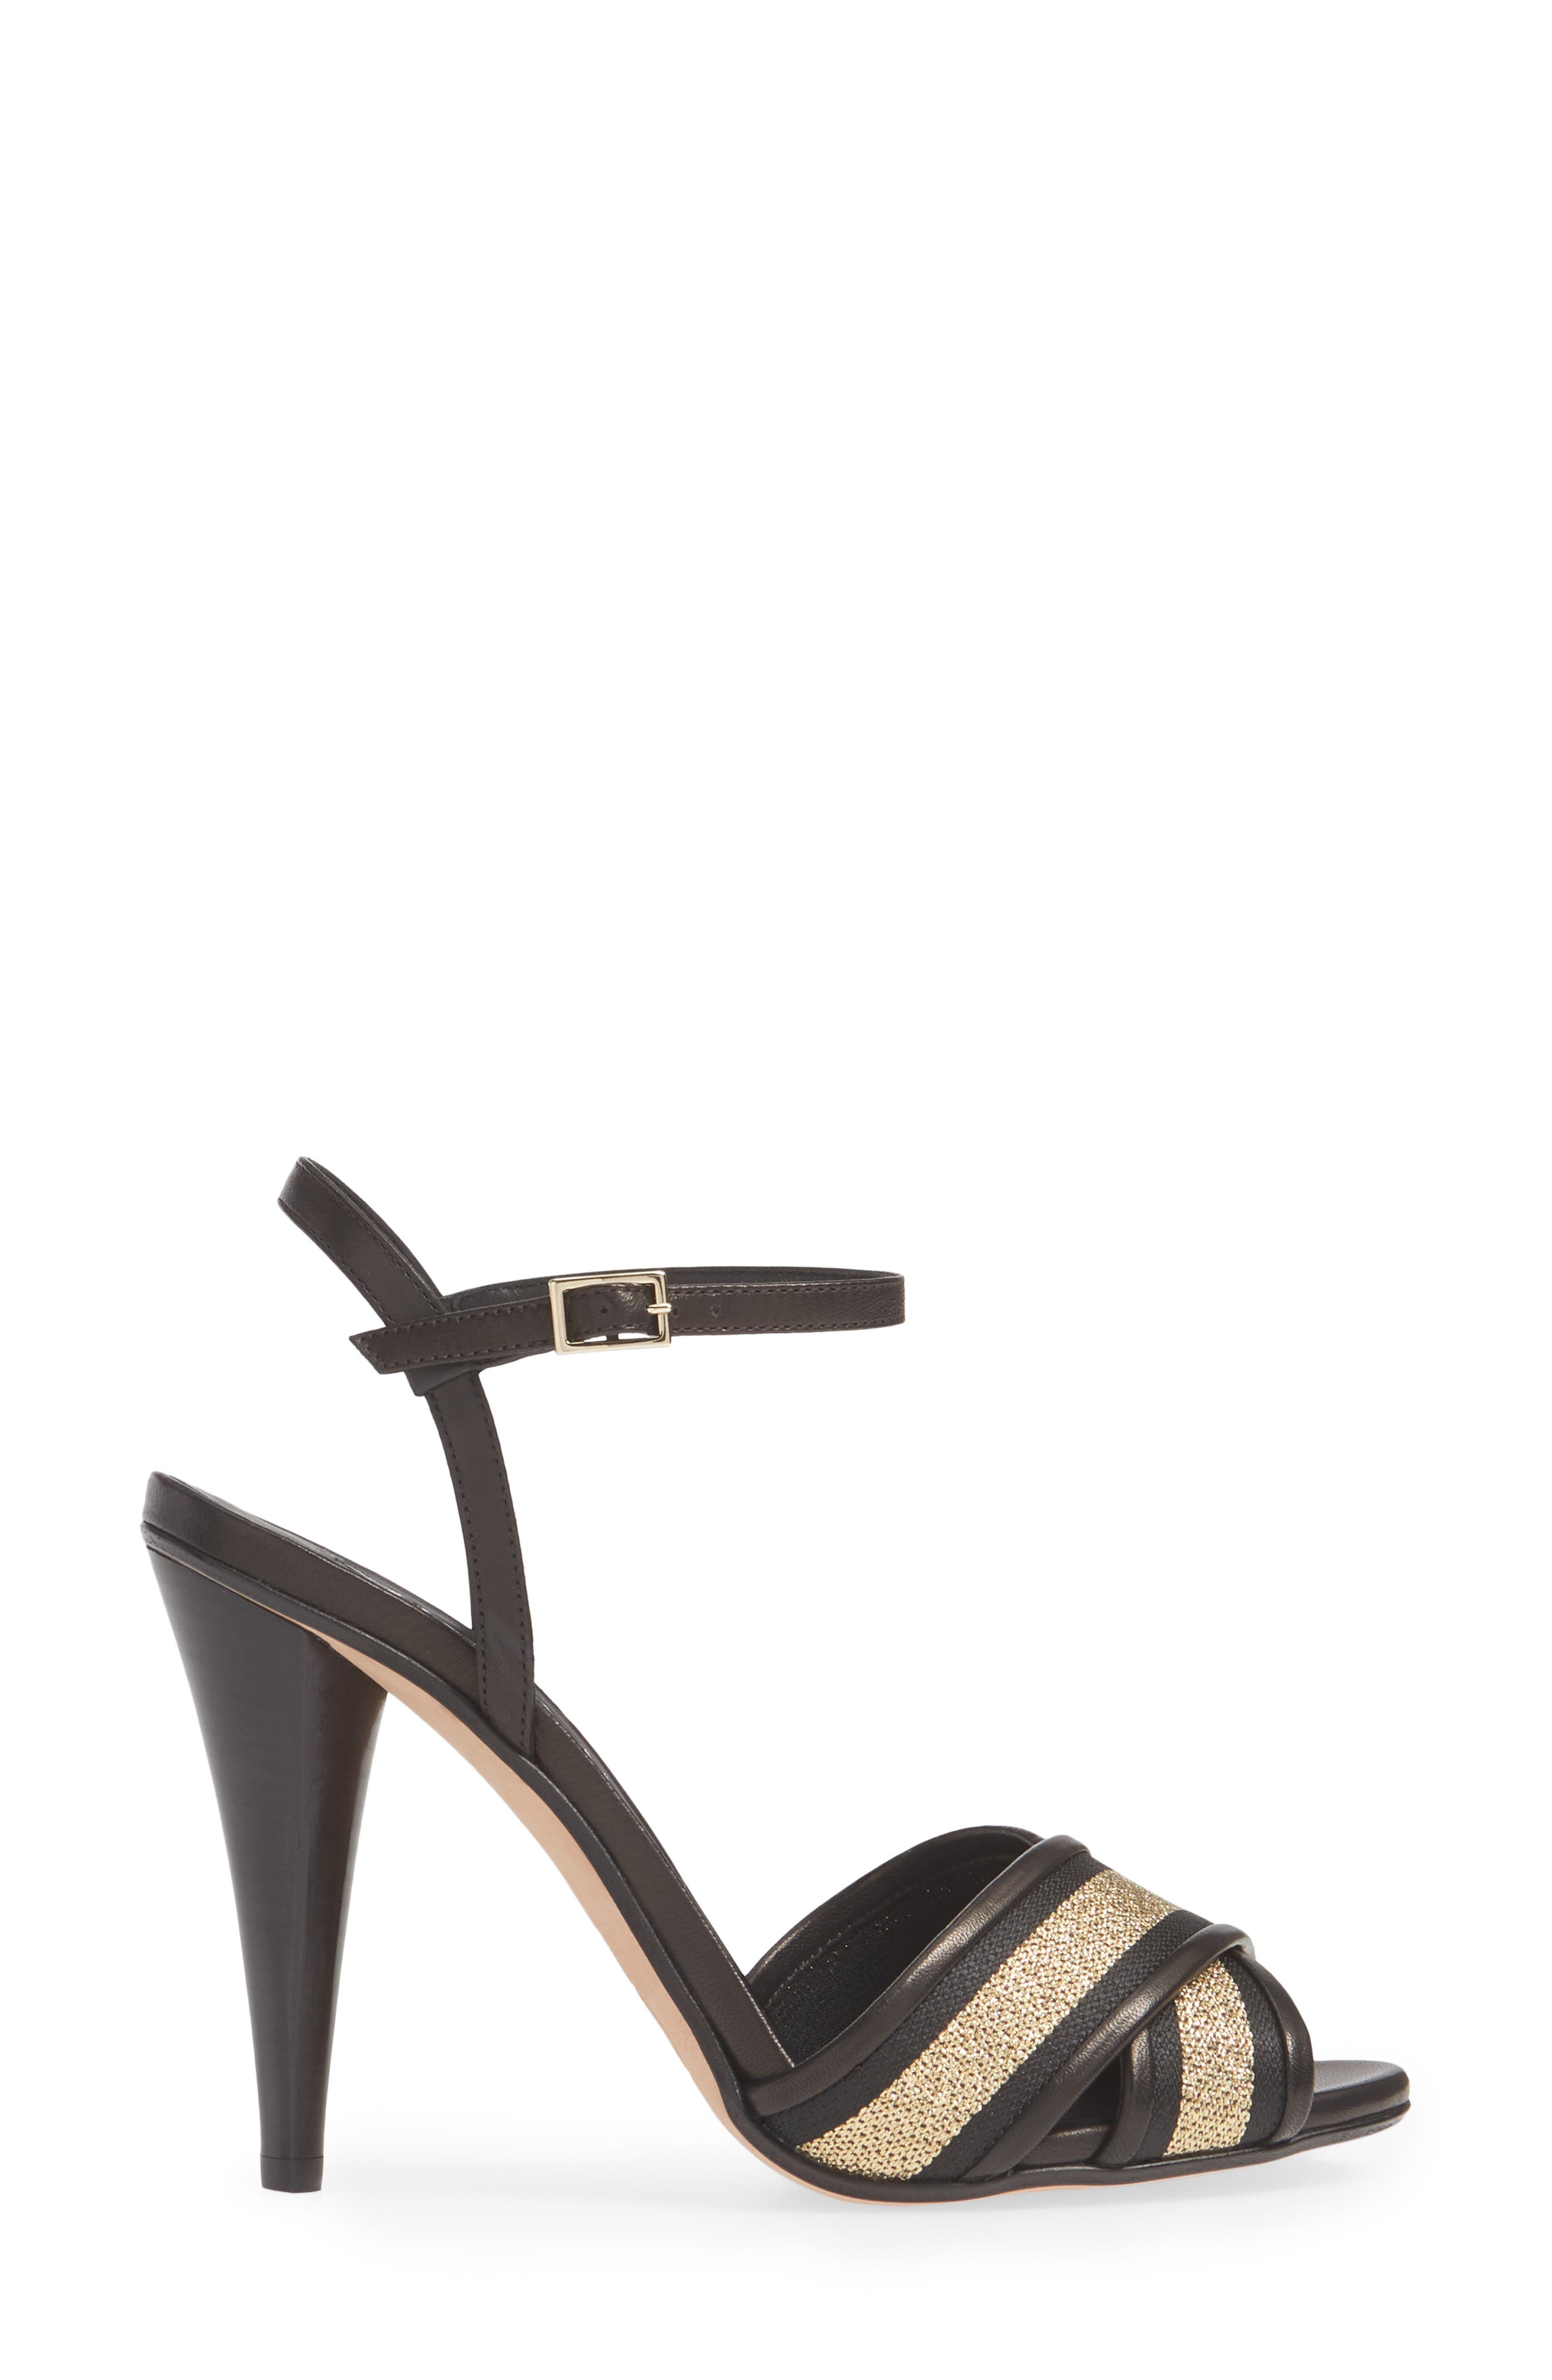 VERONICA BEARD,                             Olympia Quarter Strap Sandal,                             Alternate thumbnail 3, color,                             BLACK/ GOLD